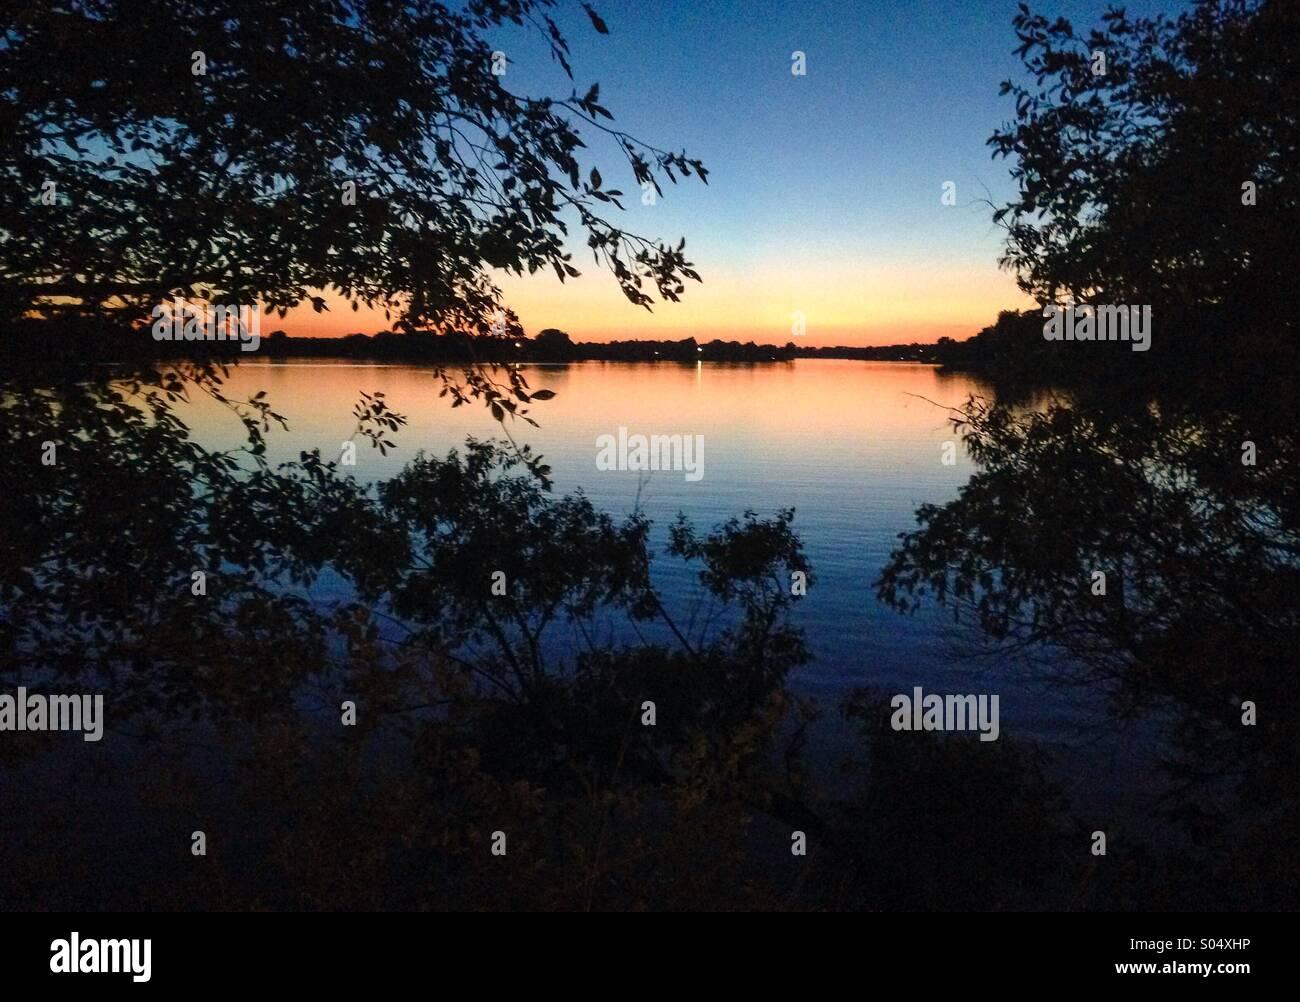 Mitchell, SD lake - Stock Image